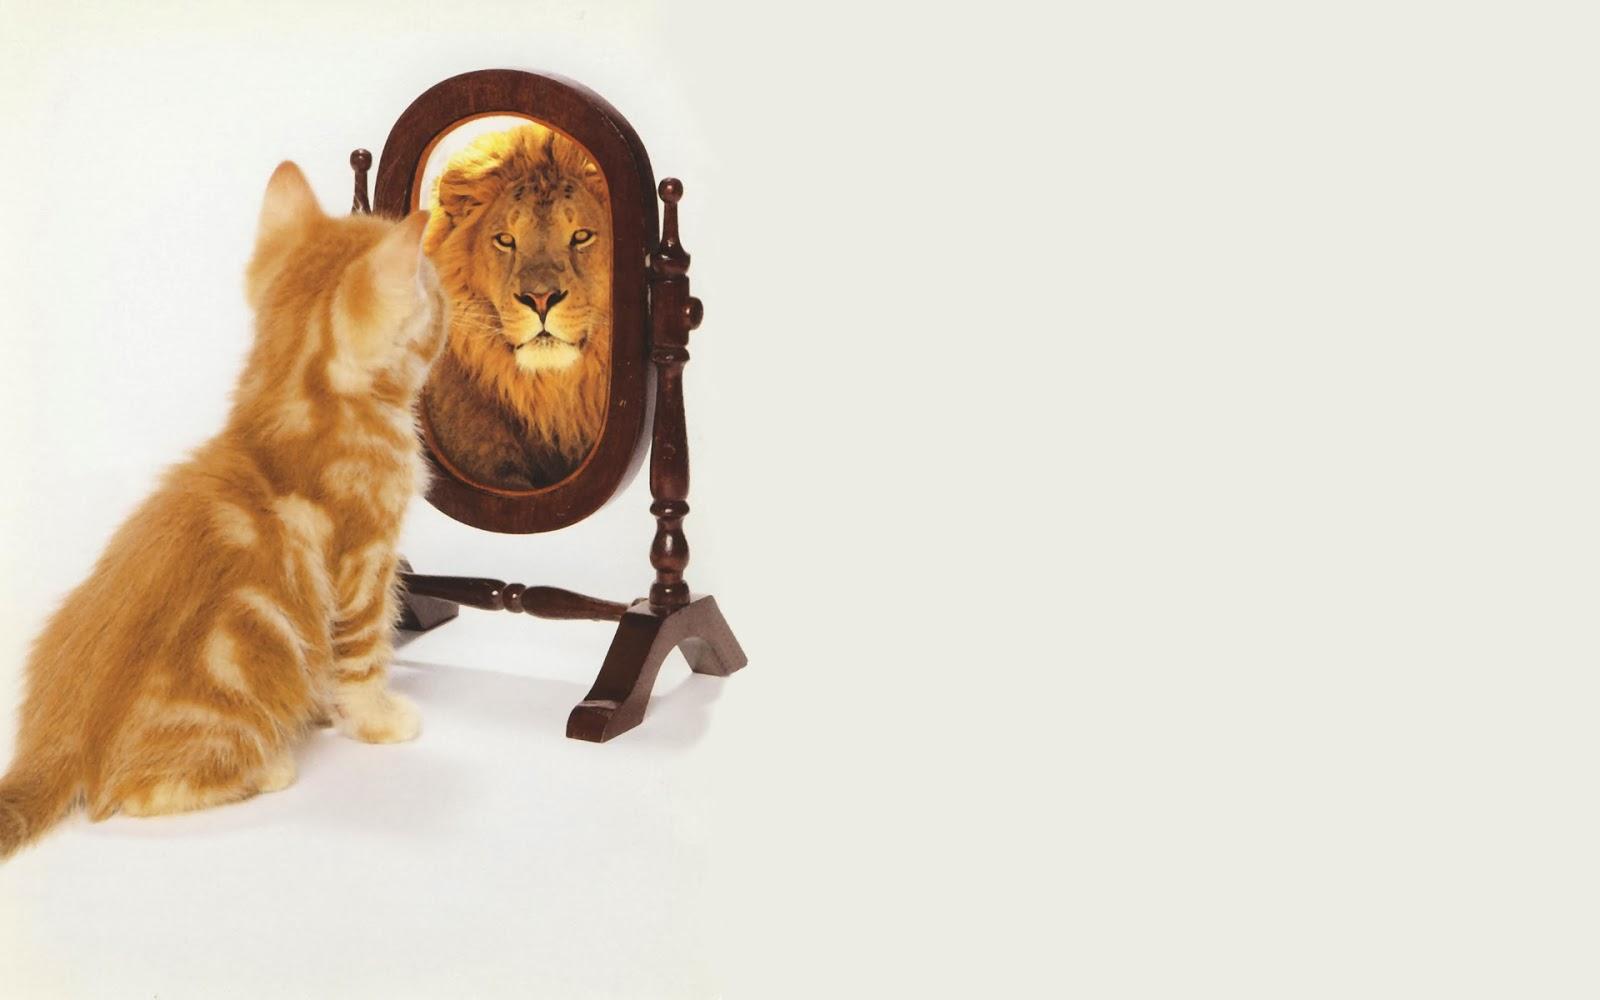 kedi, aslan, ayna, ego, narsizm